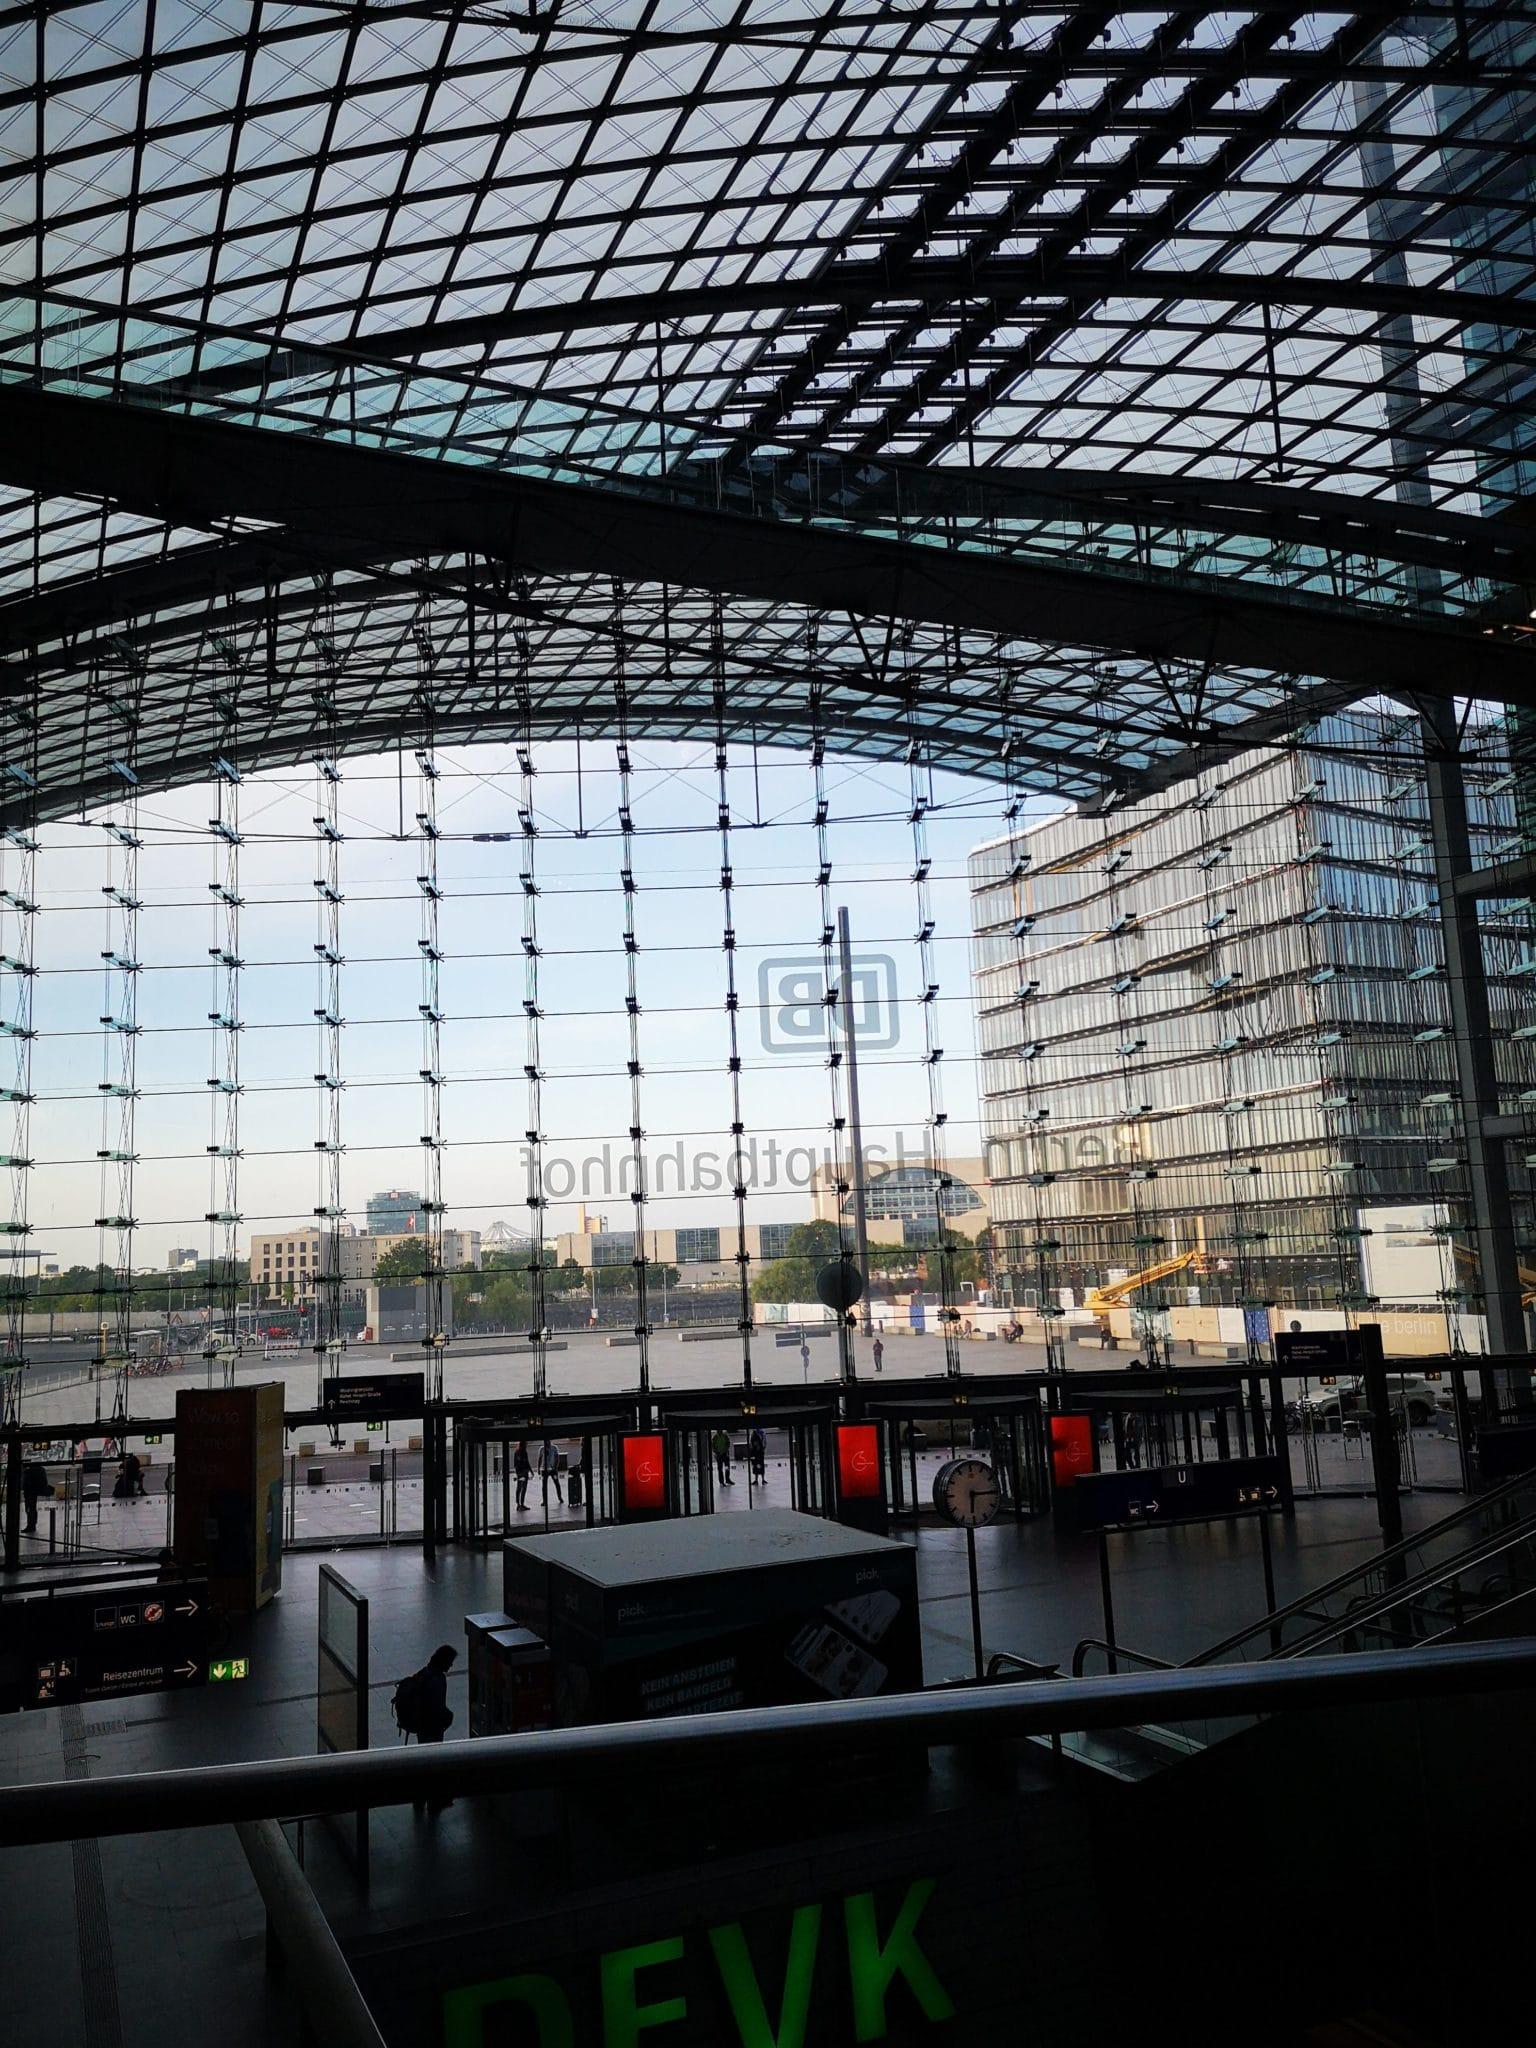 Hauptbahnhof Berlin früh am Morgen.